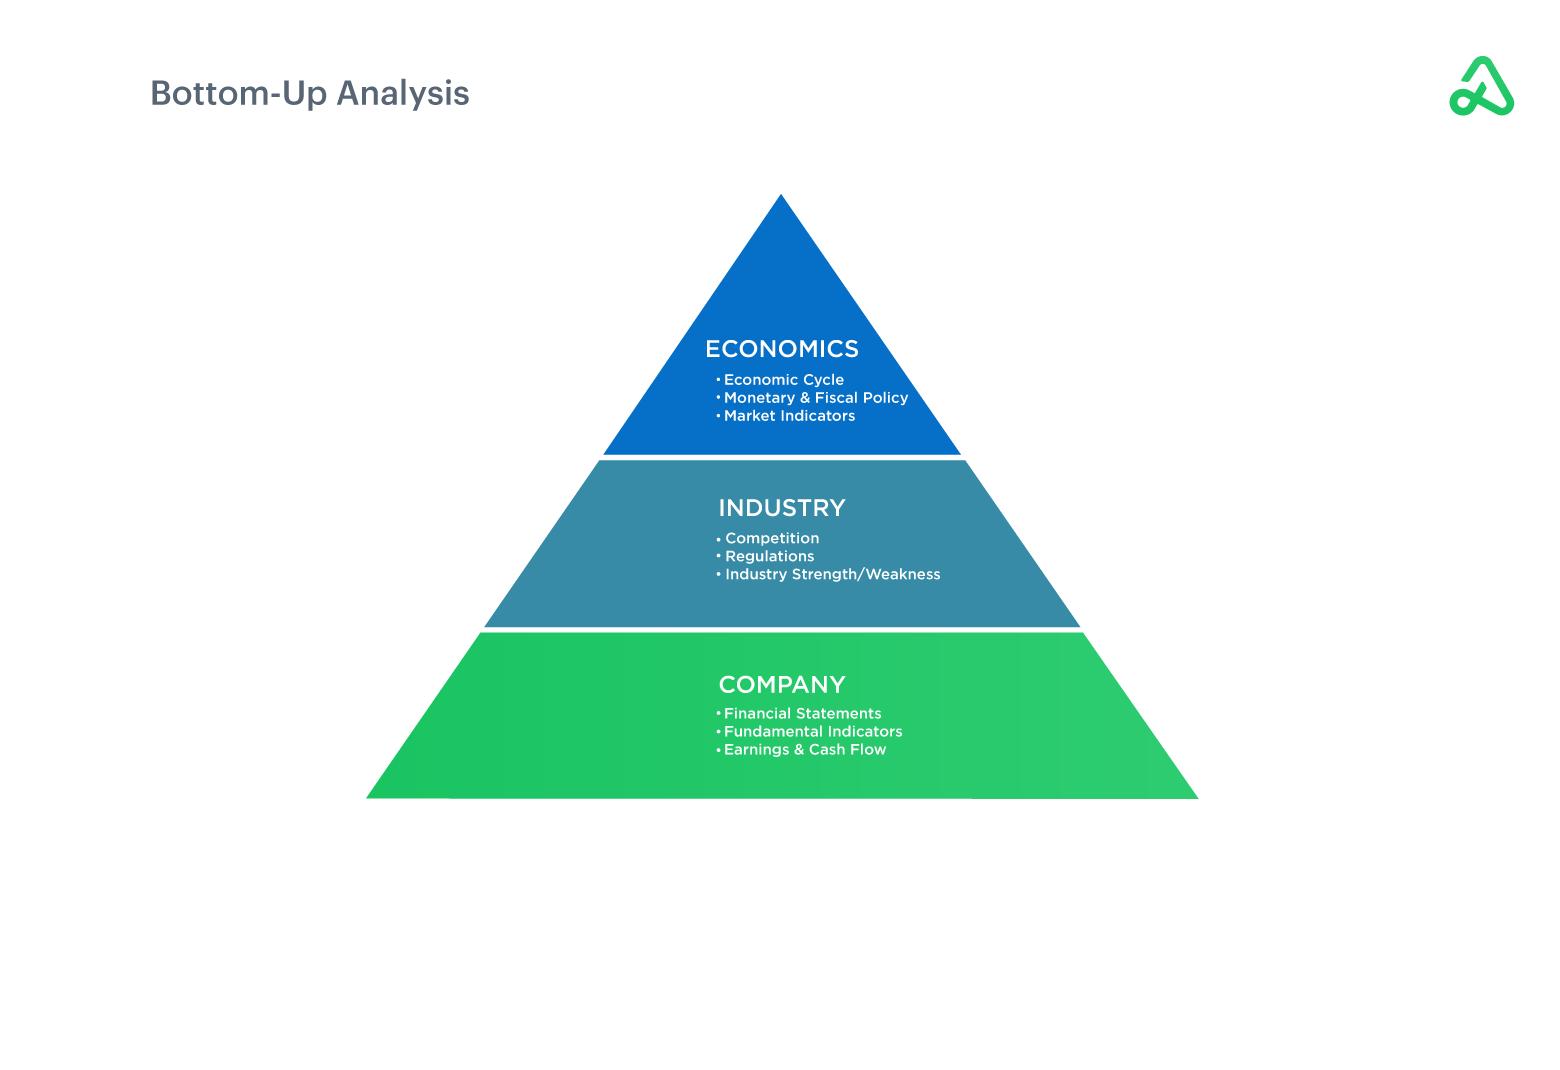 Bottom-Up Analysis example image